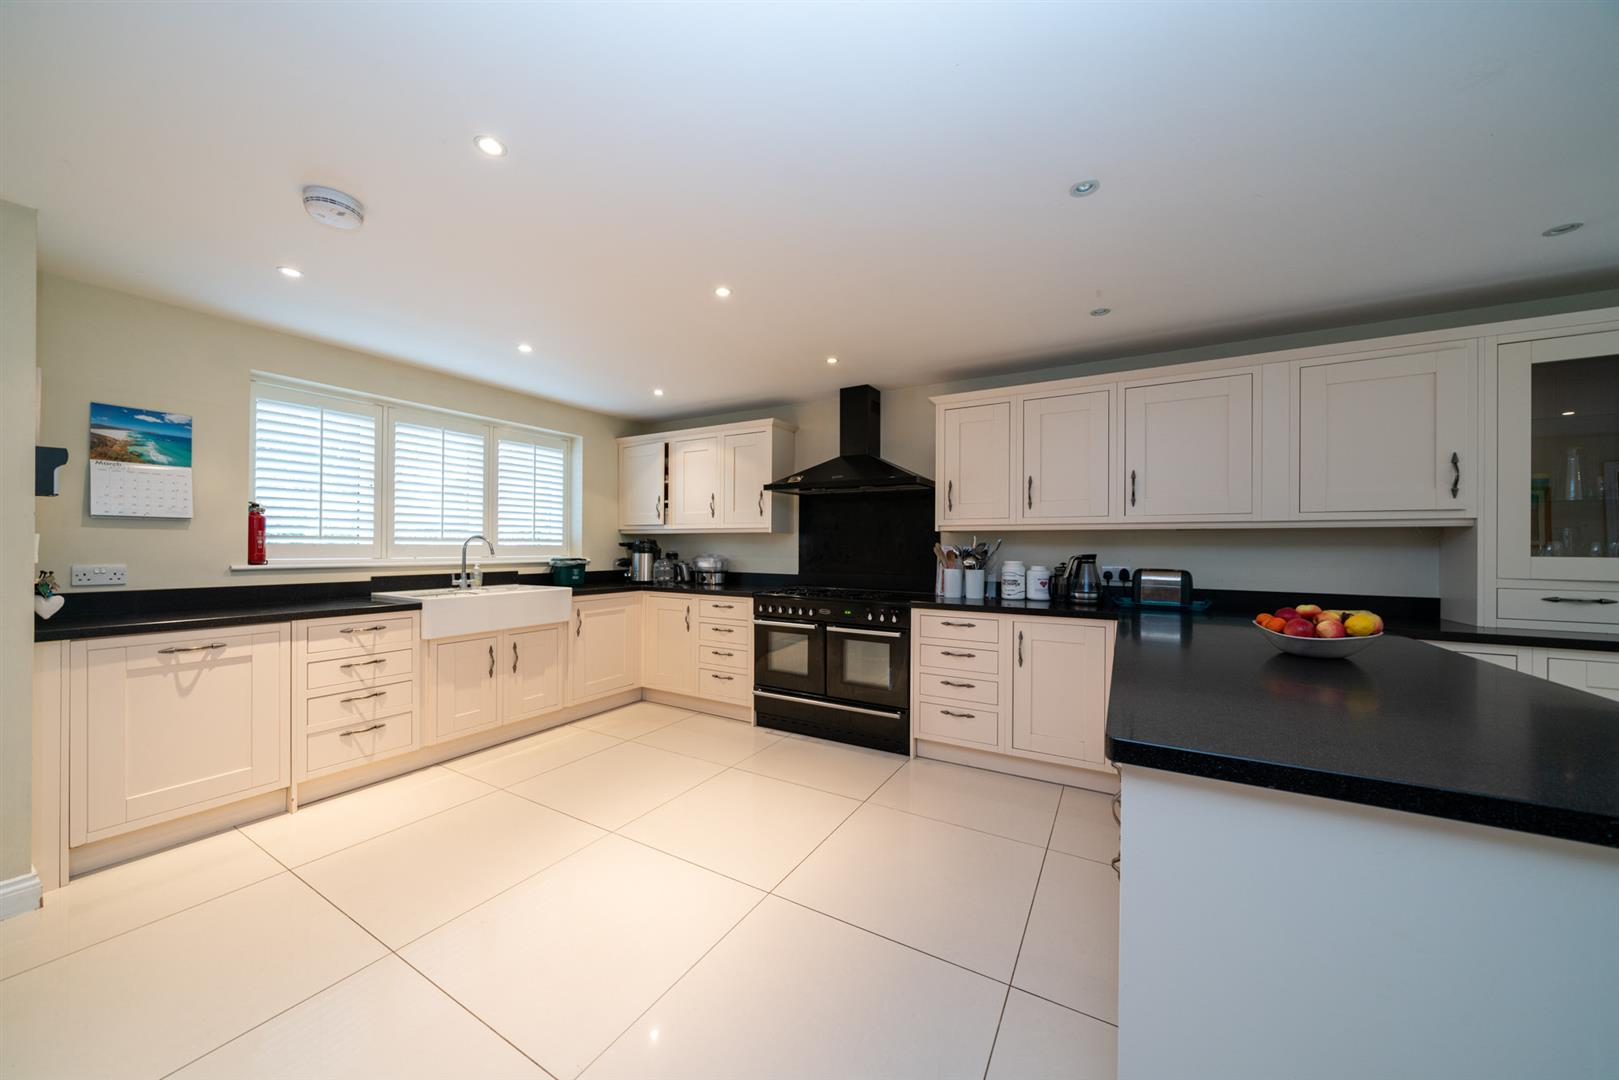 15-Hedgeside-5930 - kitchen 1.jpg